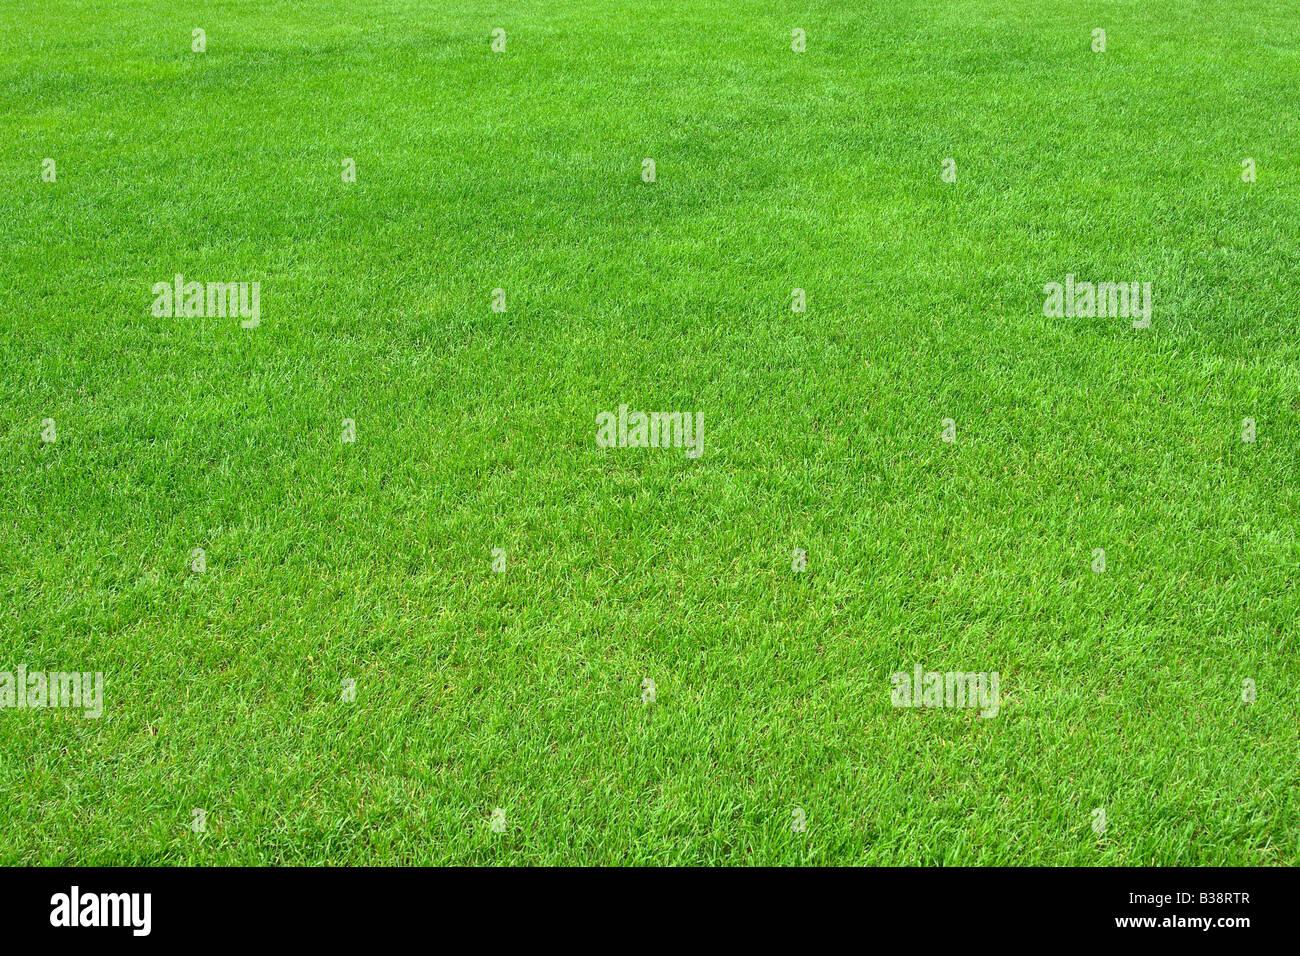 Reine leere grüne Wiese horizontal geschnitten Stockbild